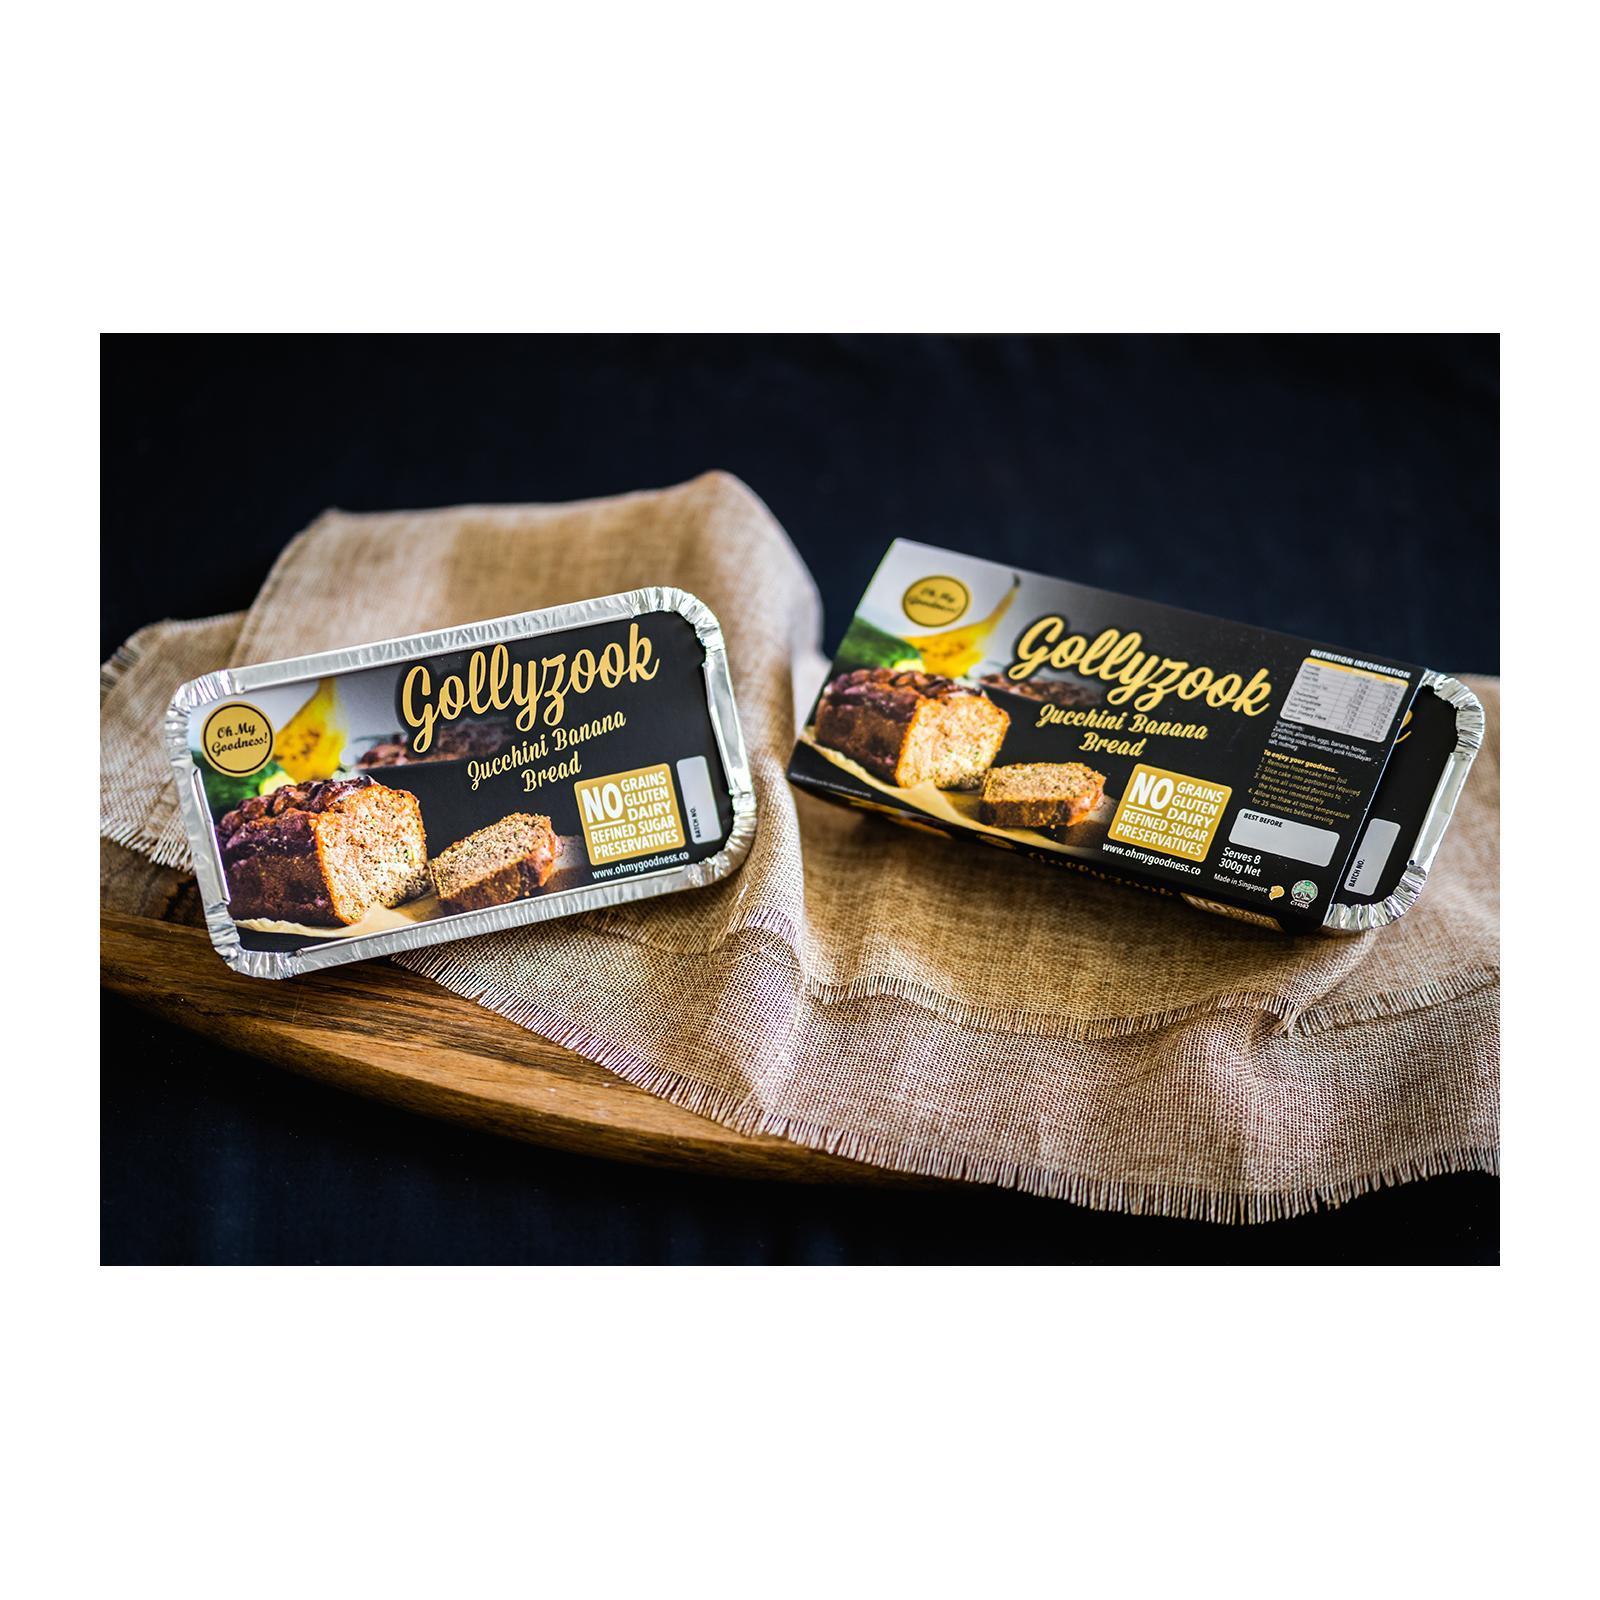 Oh My Goodness! Gollyzook - Zucchini Banana Frozen Bread Loaf Gluten-Free Dairy-Free - Frozen